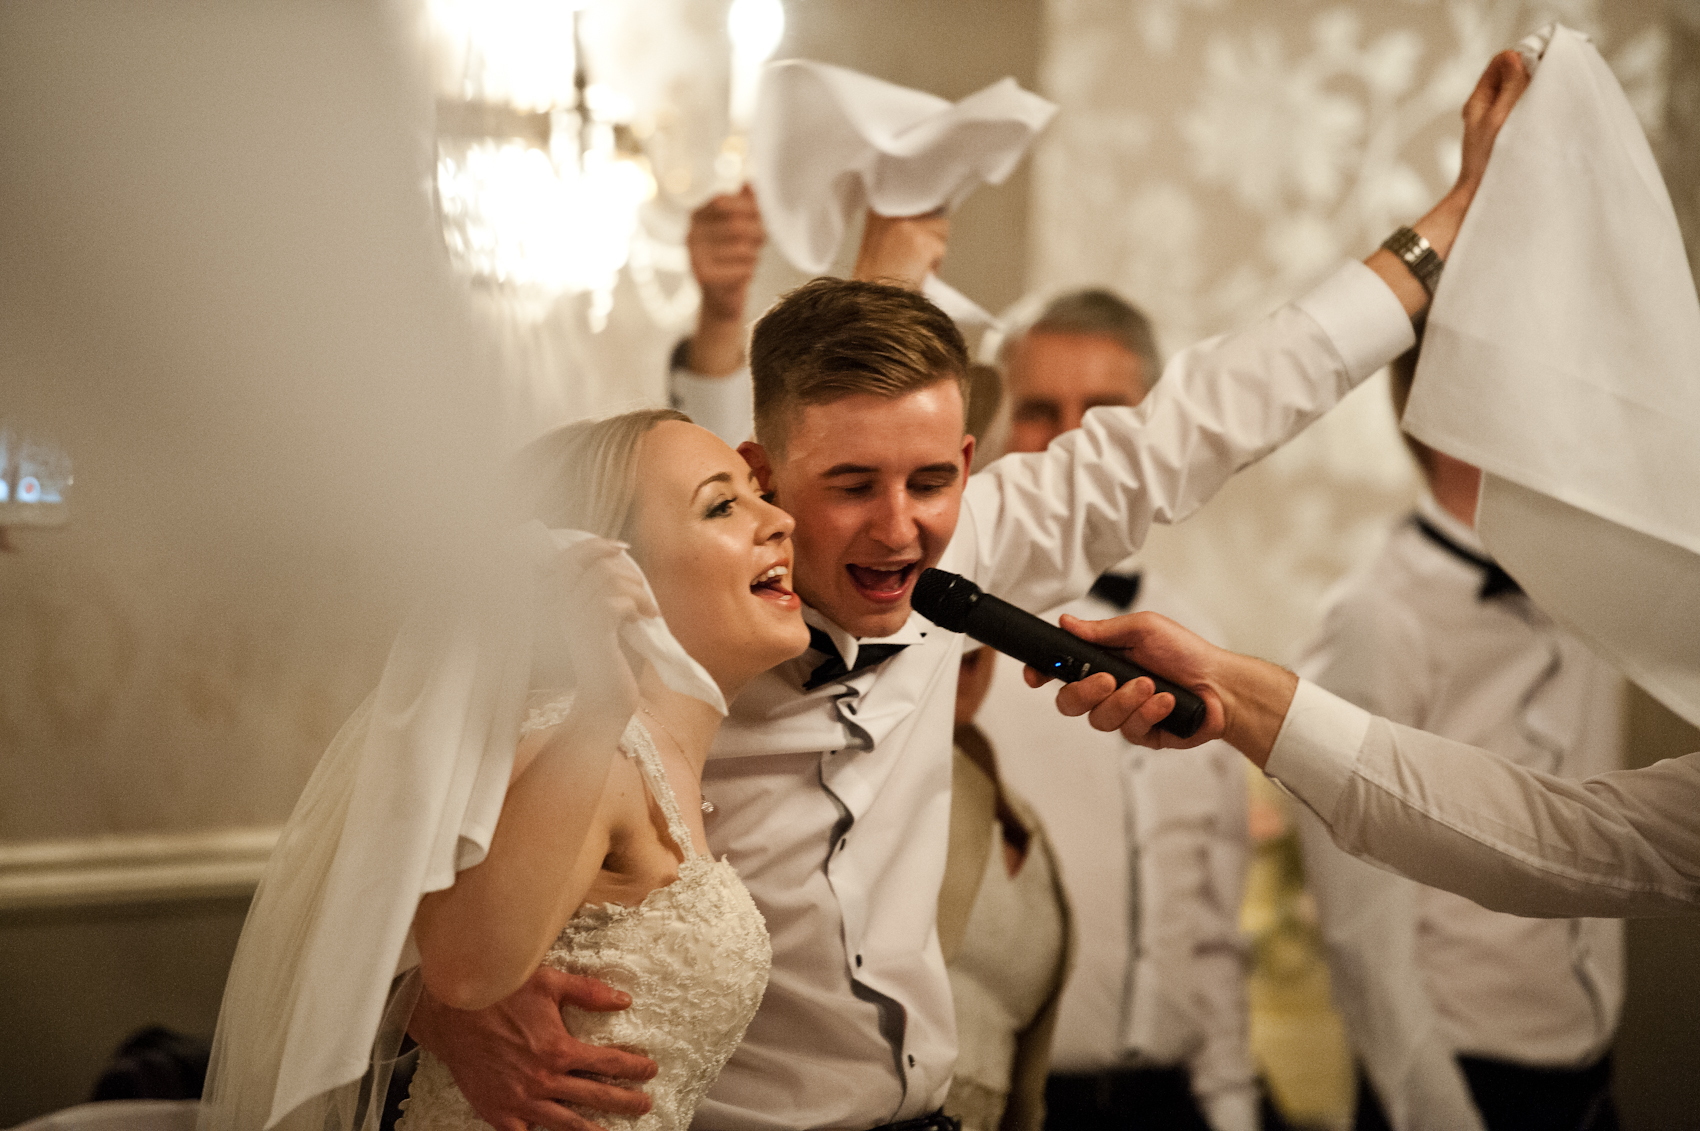 Declan & Emma wedding (22 of 29).jpg